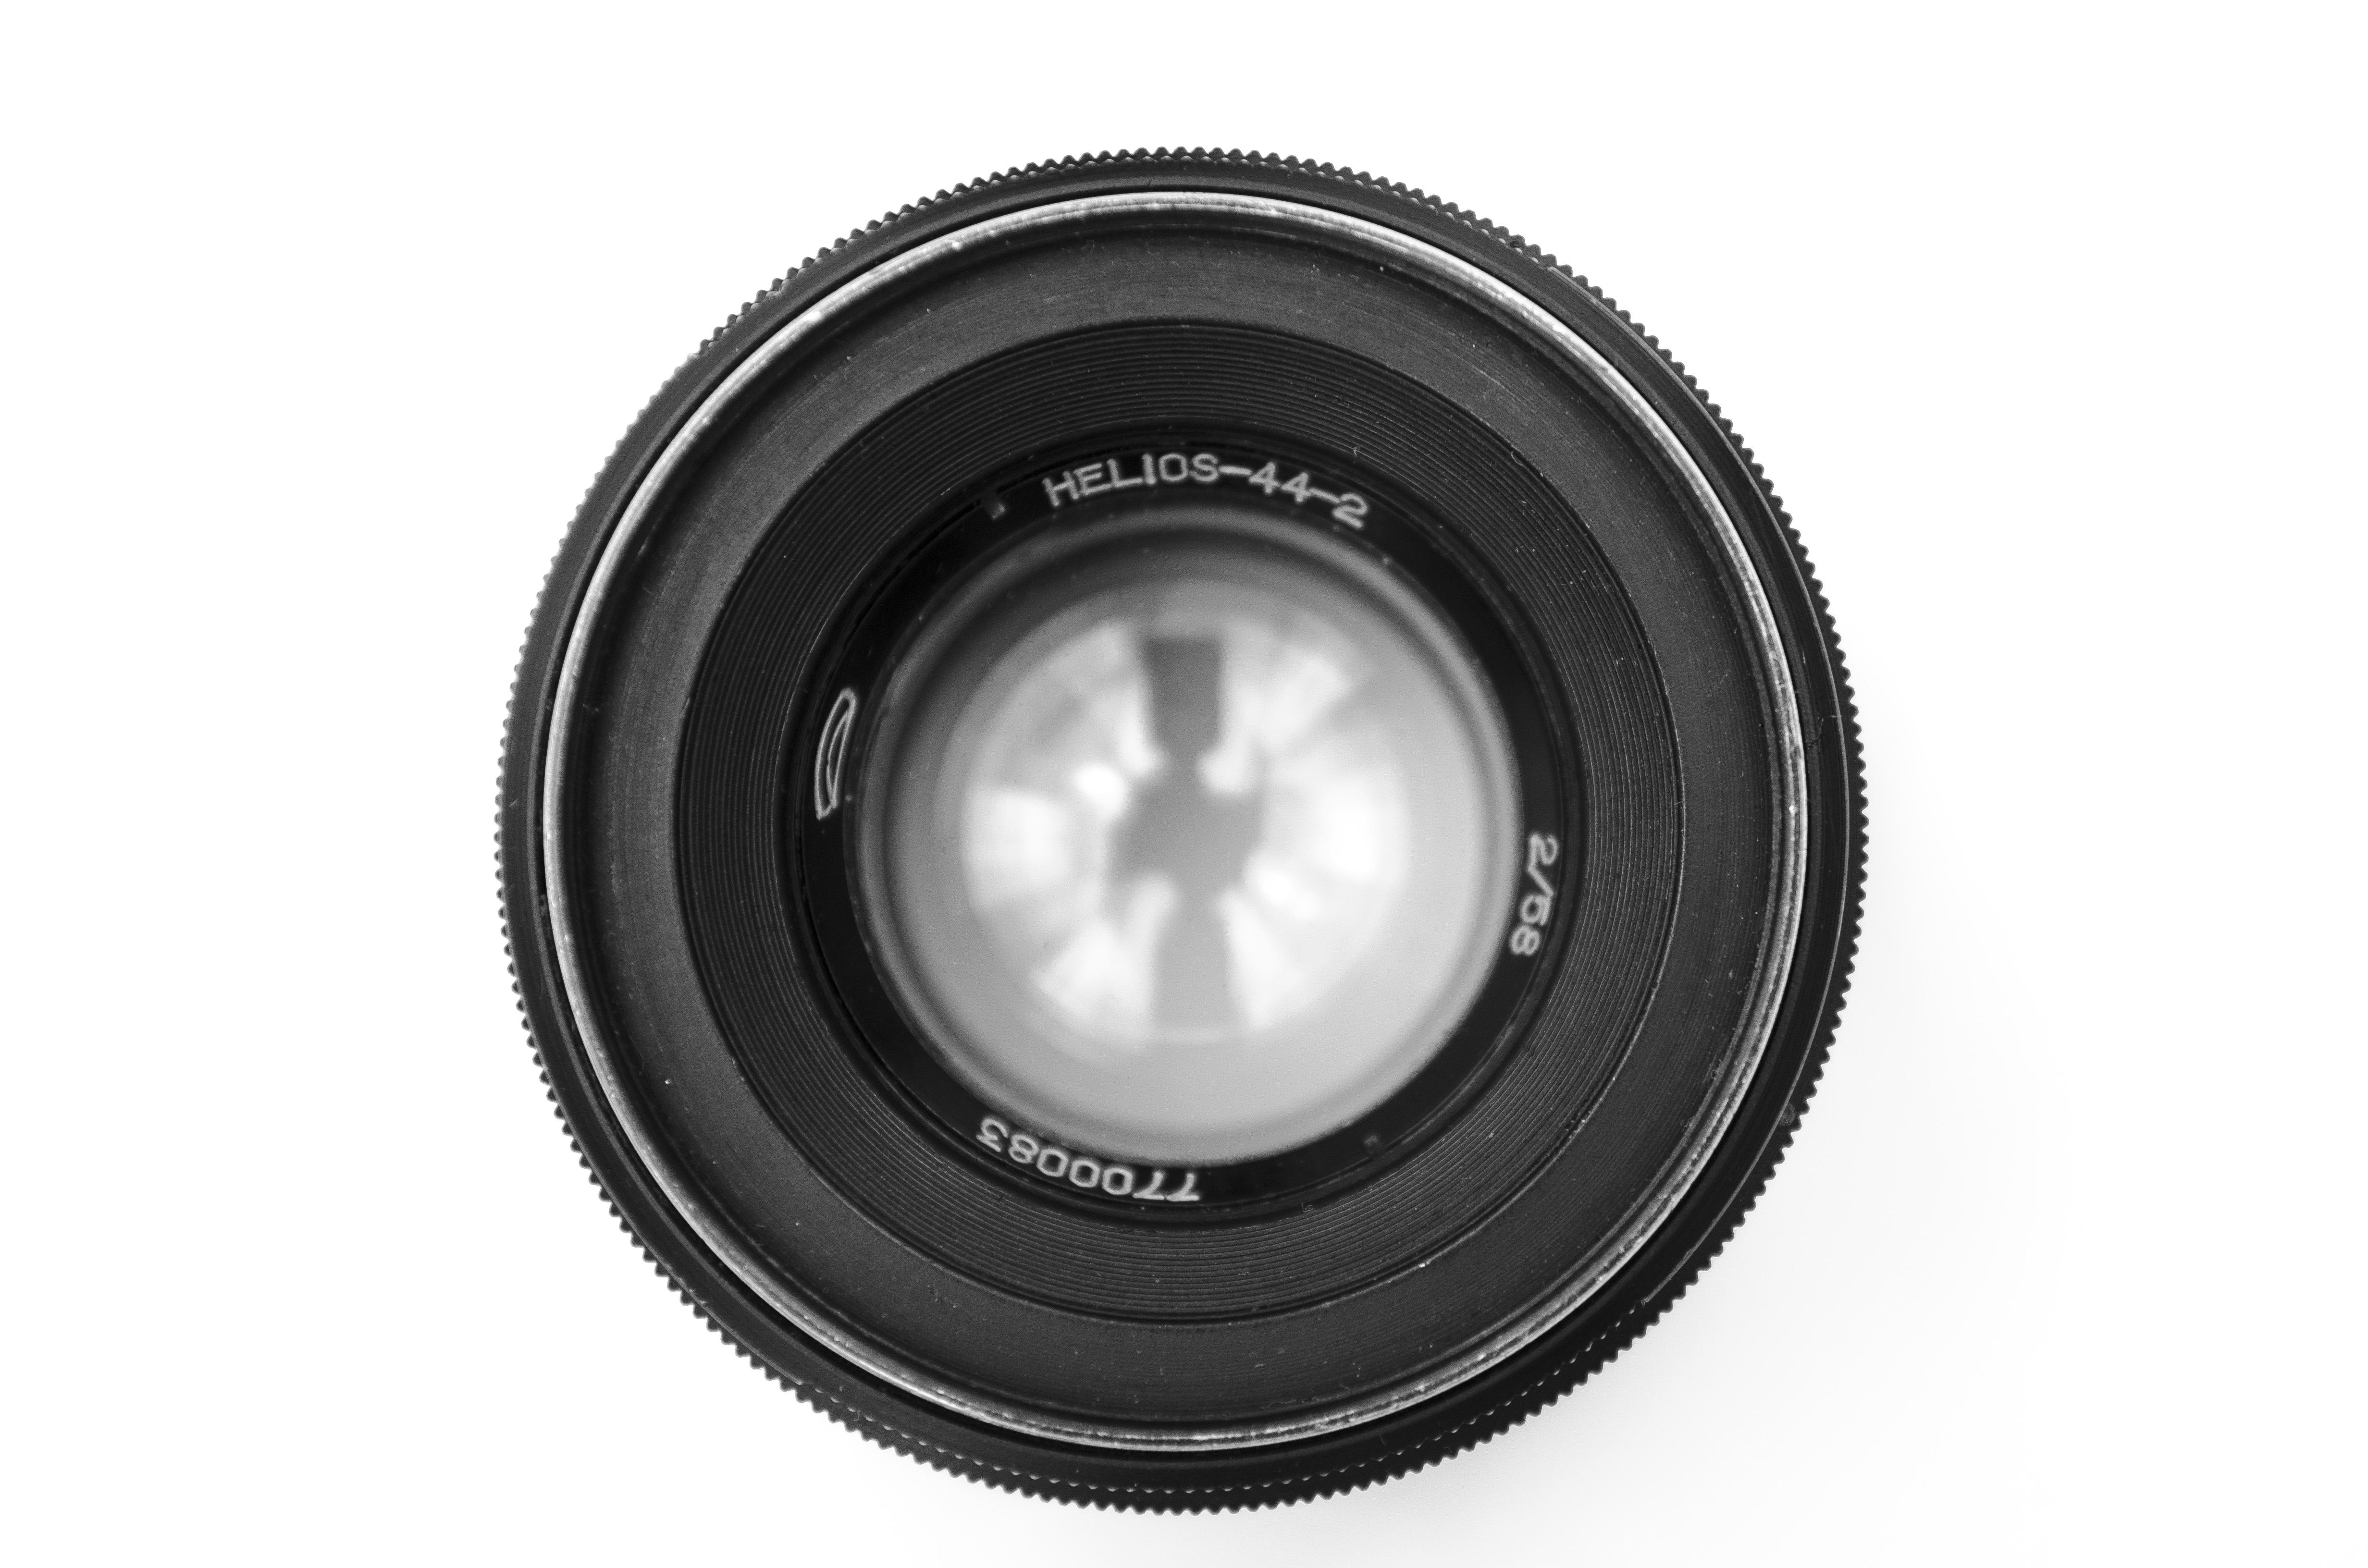 Free Images : wheel, retro, product, subwoofer, camera ...